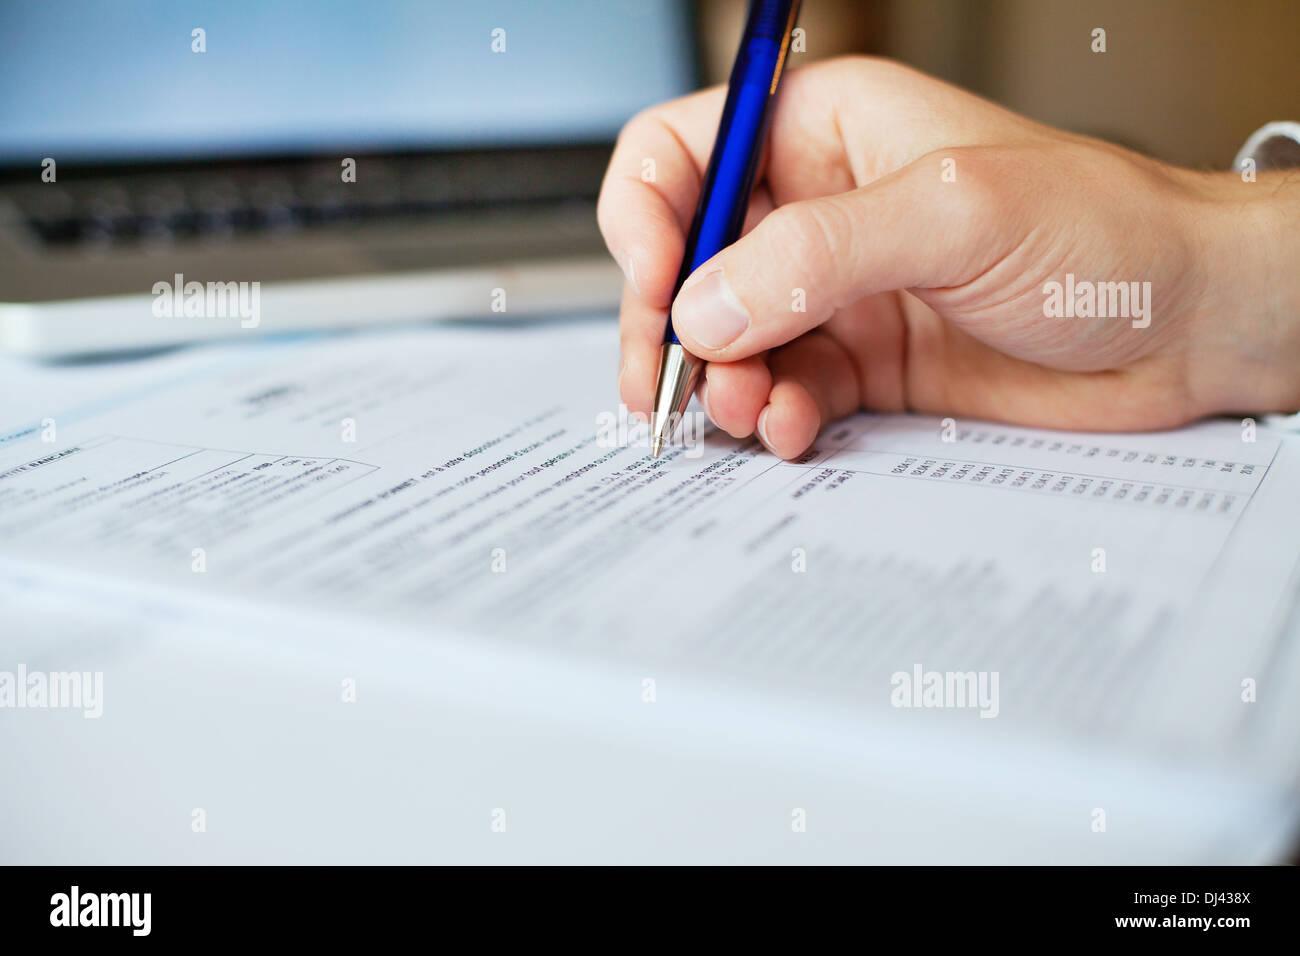 tax form analyzing - Stock Image